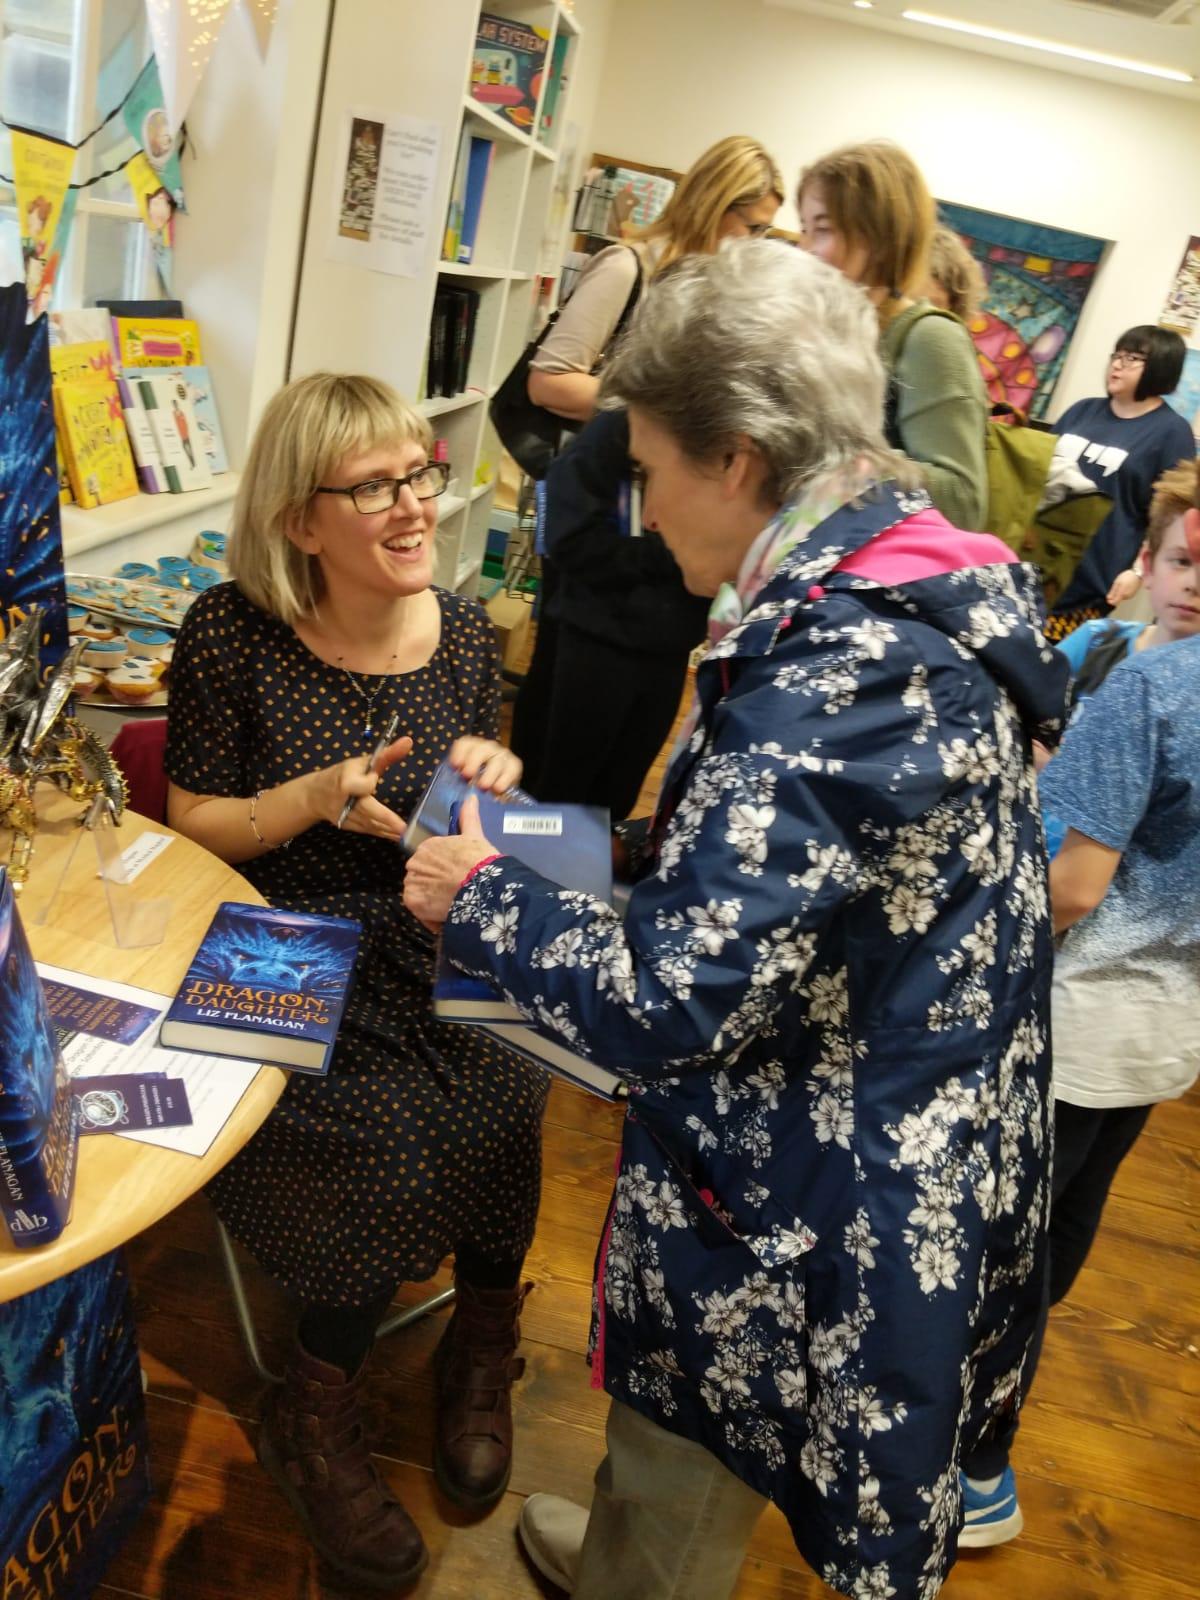 Liz book launch signing books.JPG